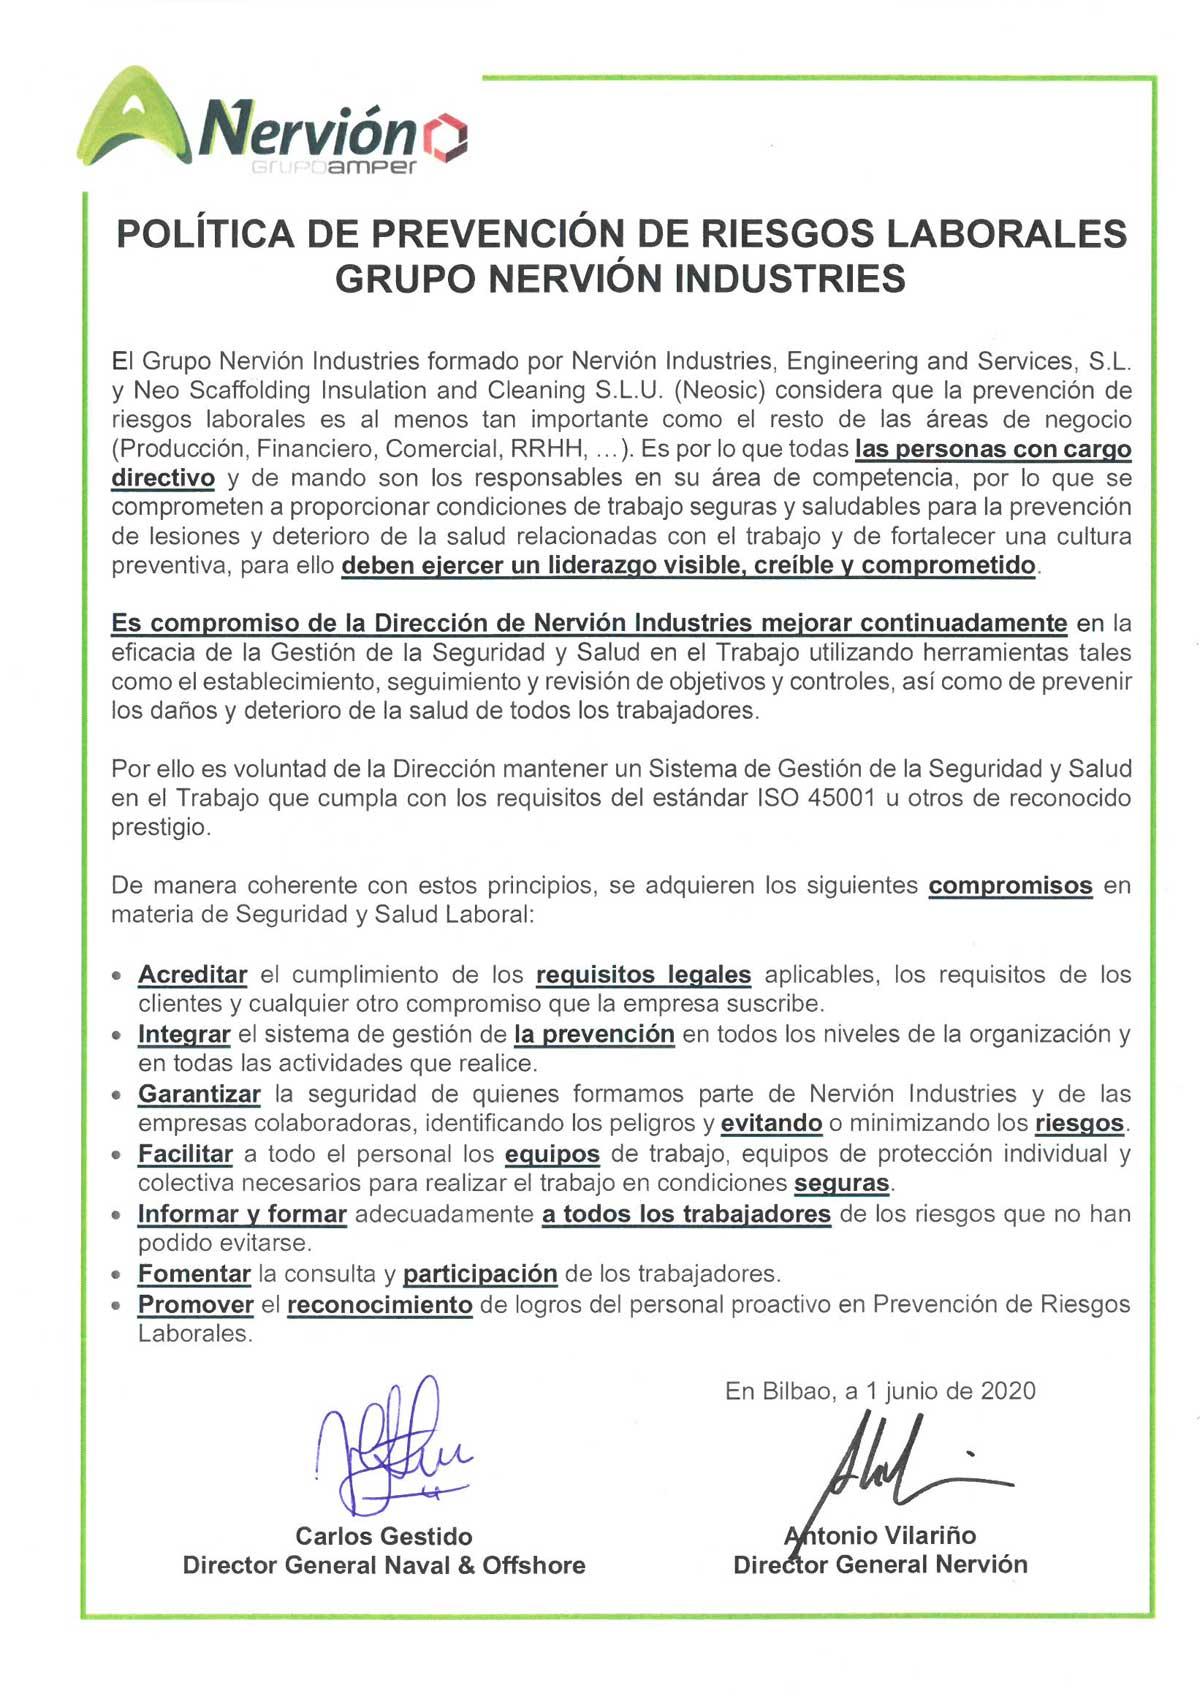 nervion-prevencion-riesgos-2021-cast